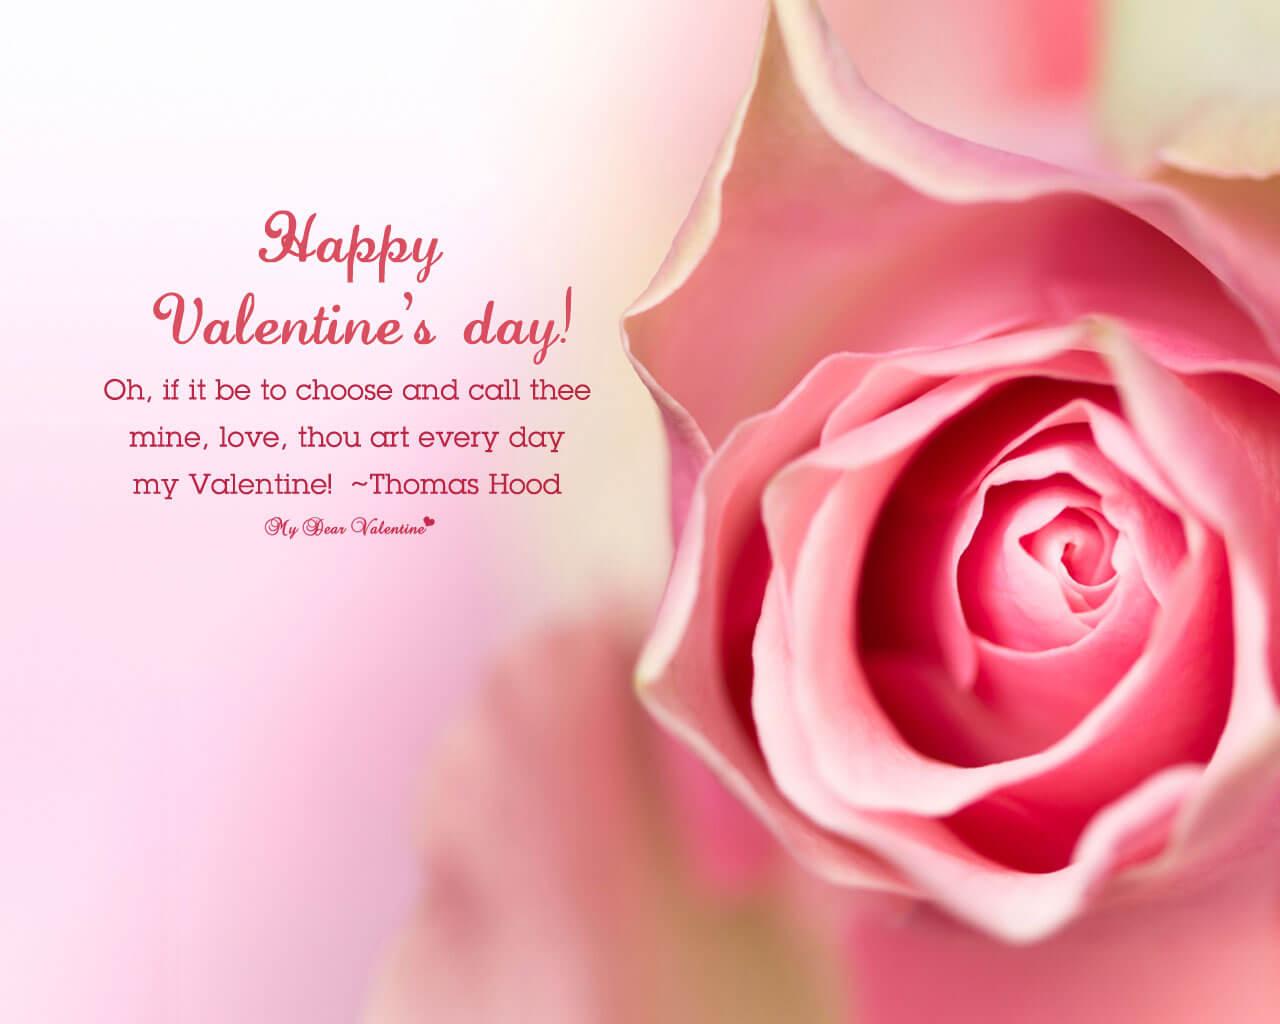 free valentine's images